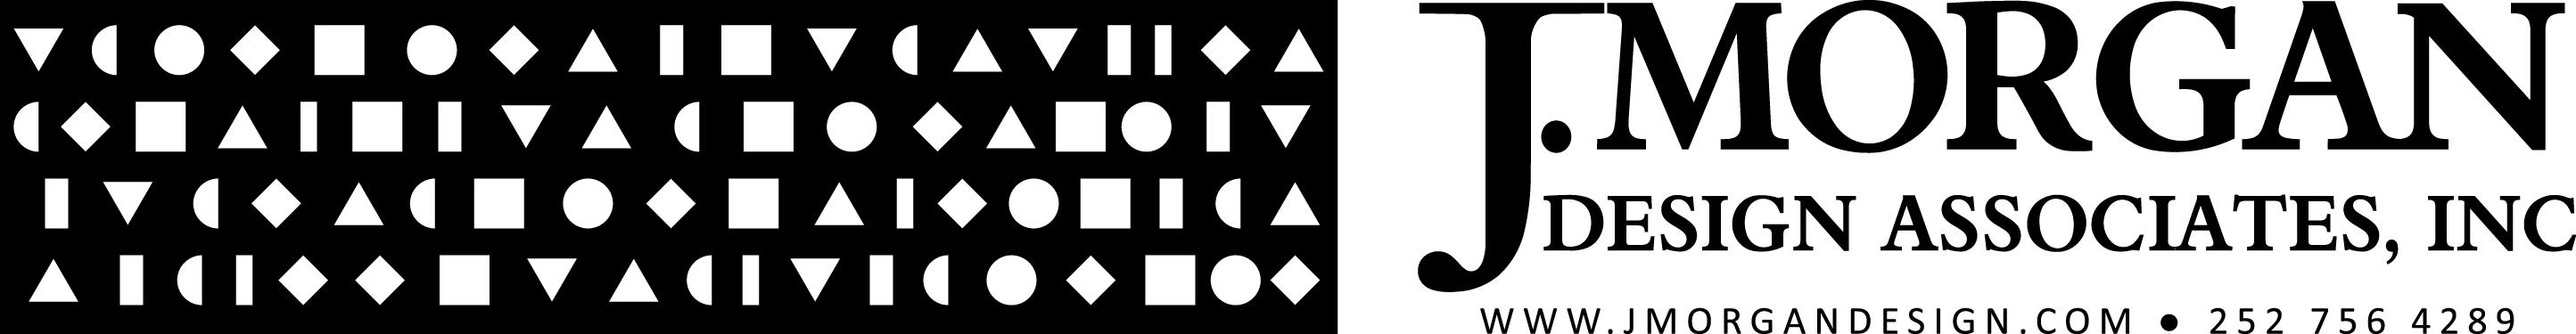 Sponsor J. Morgan Design Associates, INC.